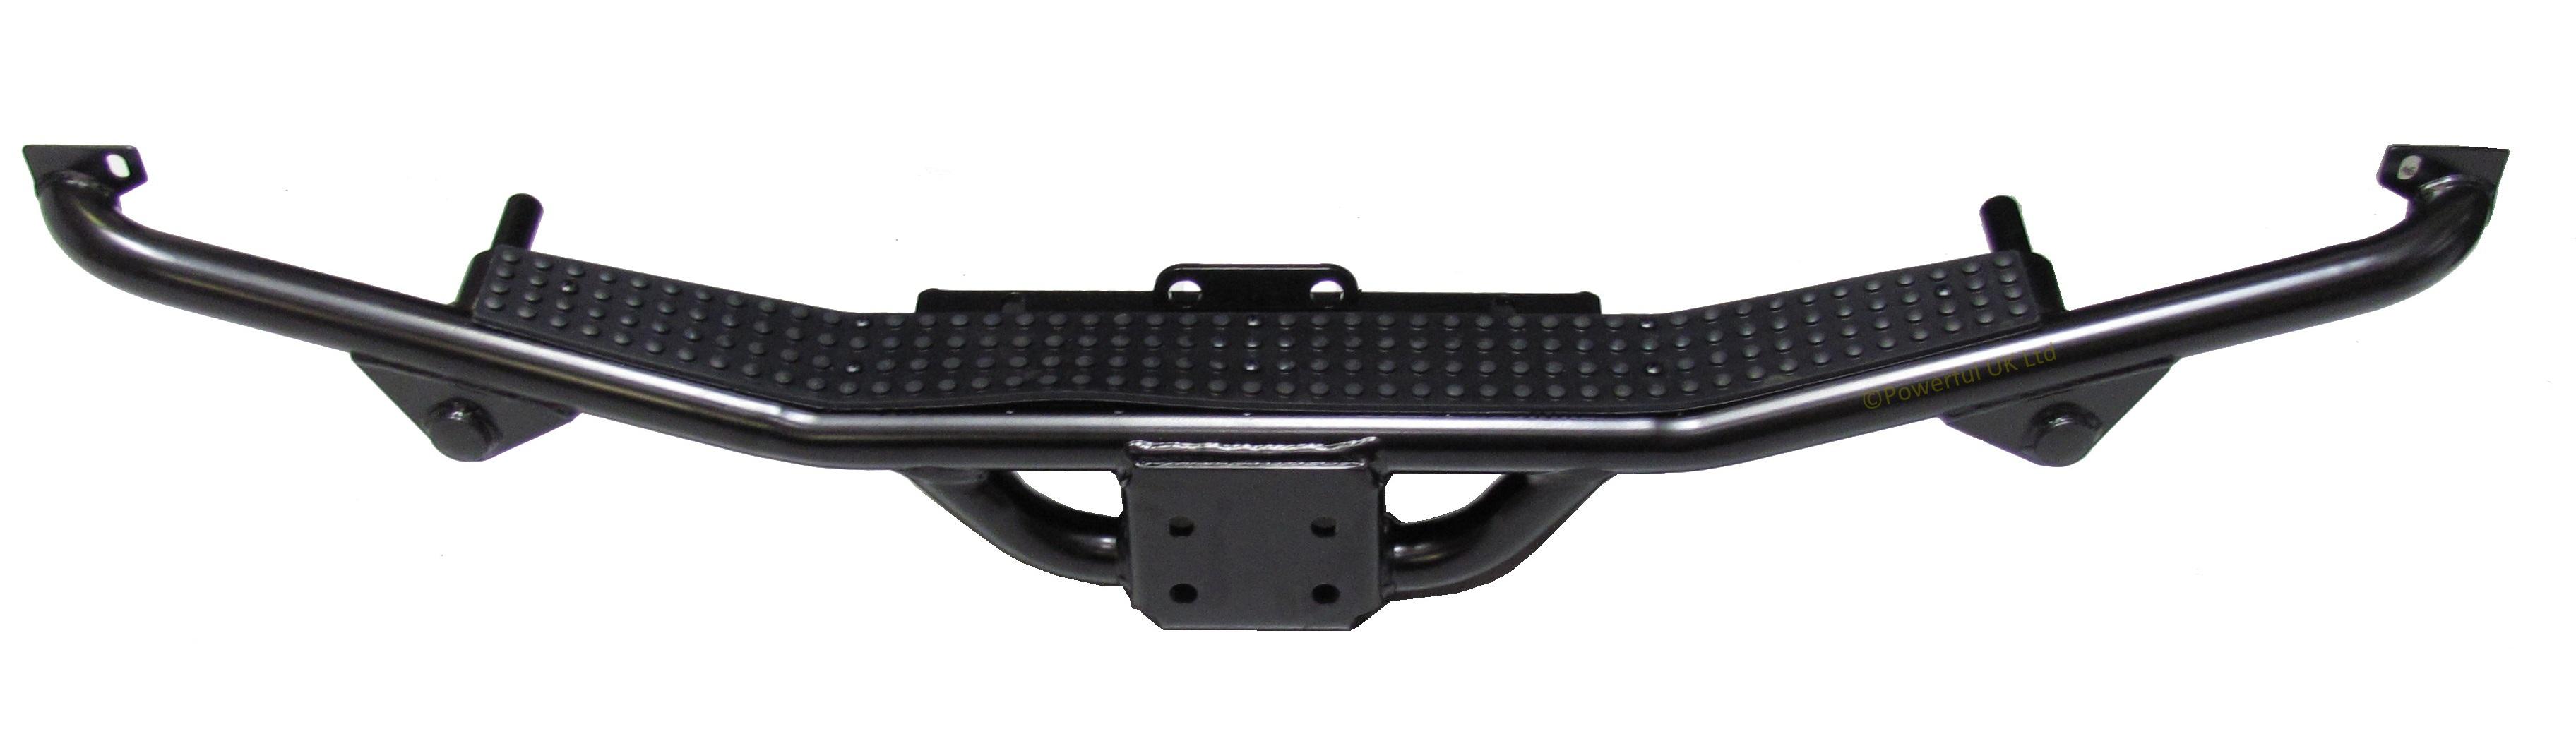 Deployed Side Steps For Range Rover Genuine Accessory: Rear Tow Bar Step Bumper For Land Rover Defender 110 SVX